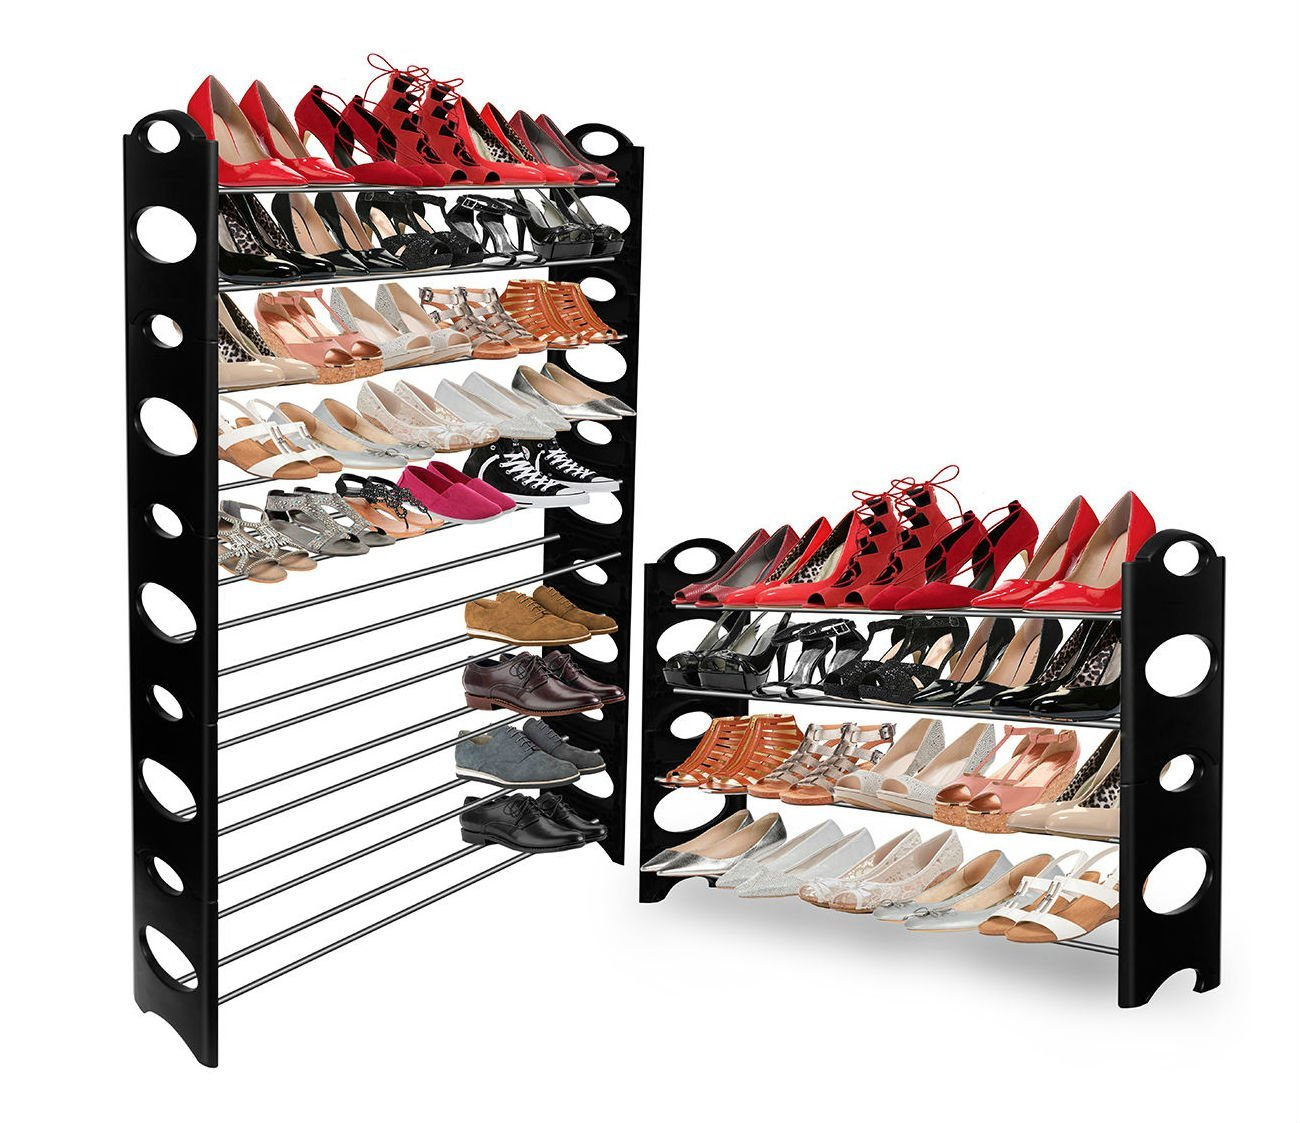 Shoe Rack for 50 Pair OxGord! Wall Bench Shelf Closet Organizer Storage Box Stand